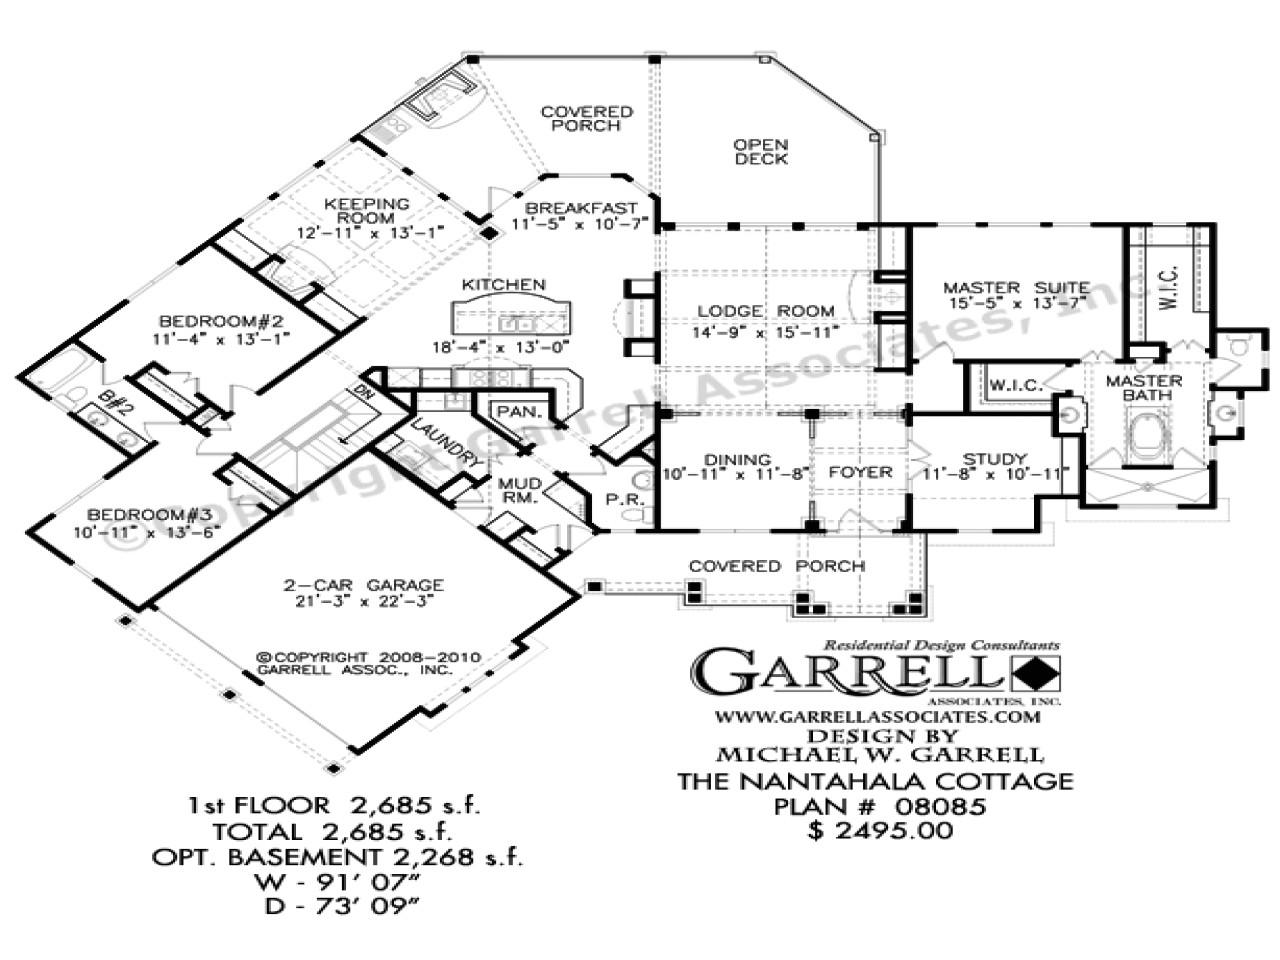 eed44964723a6391 rustic luxury mountain house plans nantahala cottage house plan